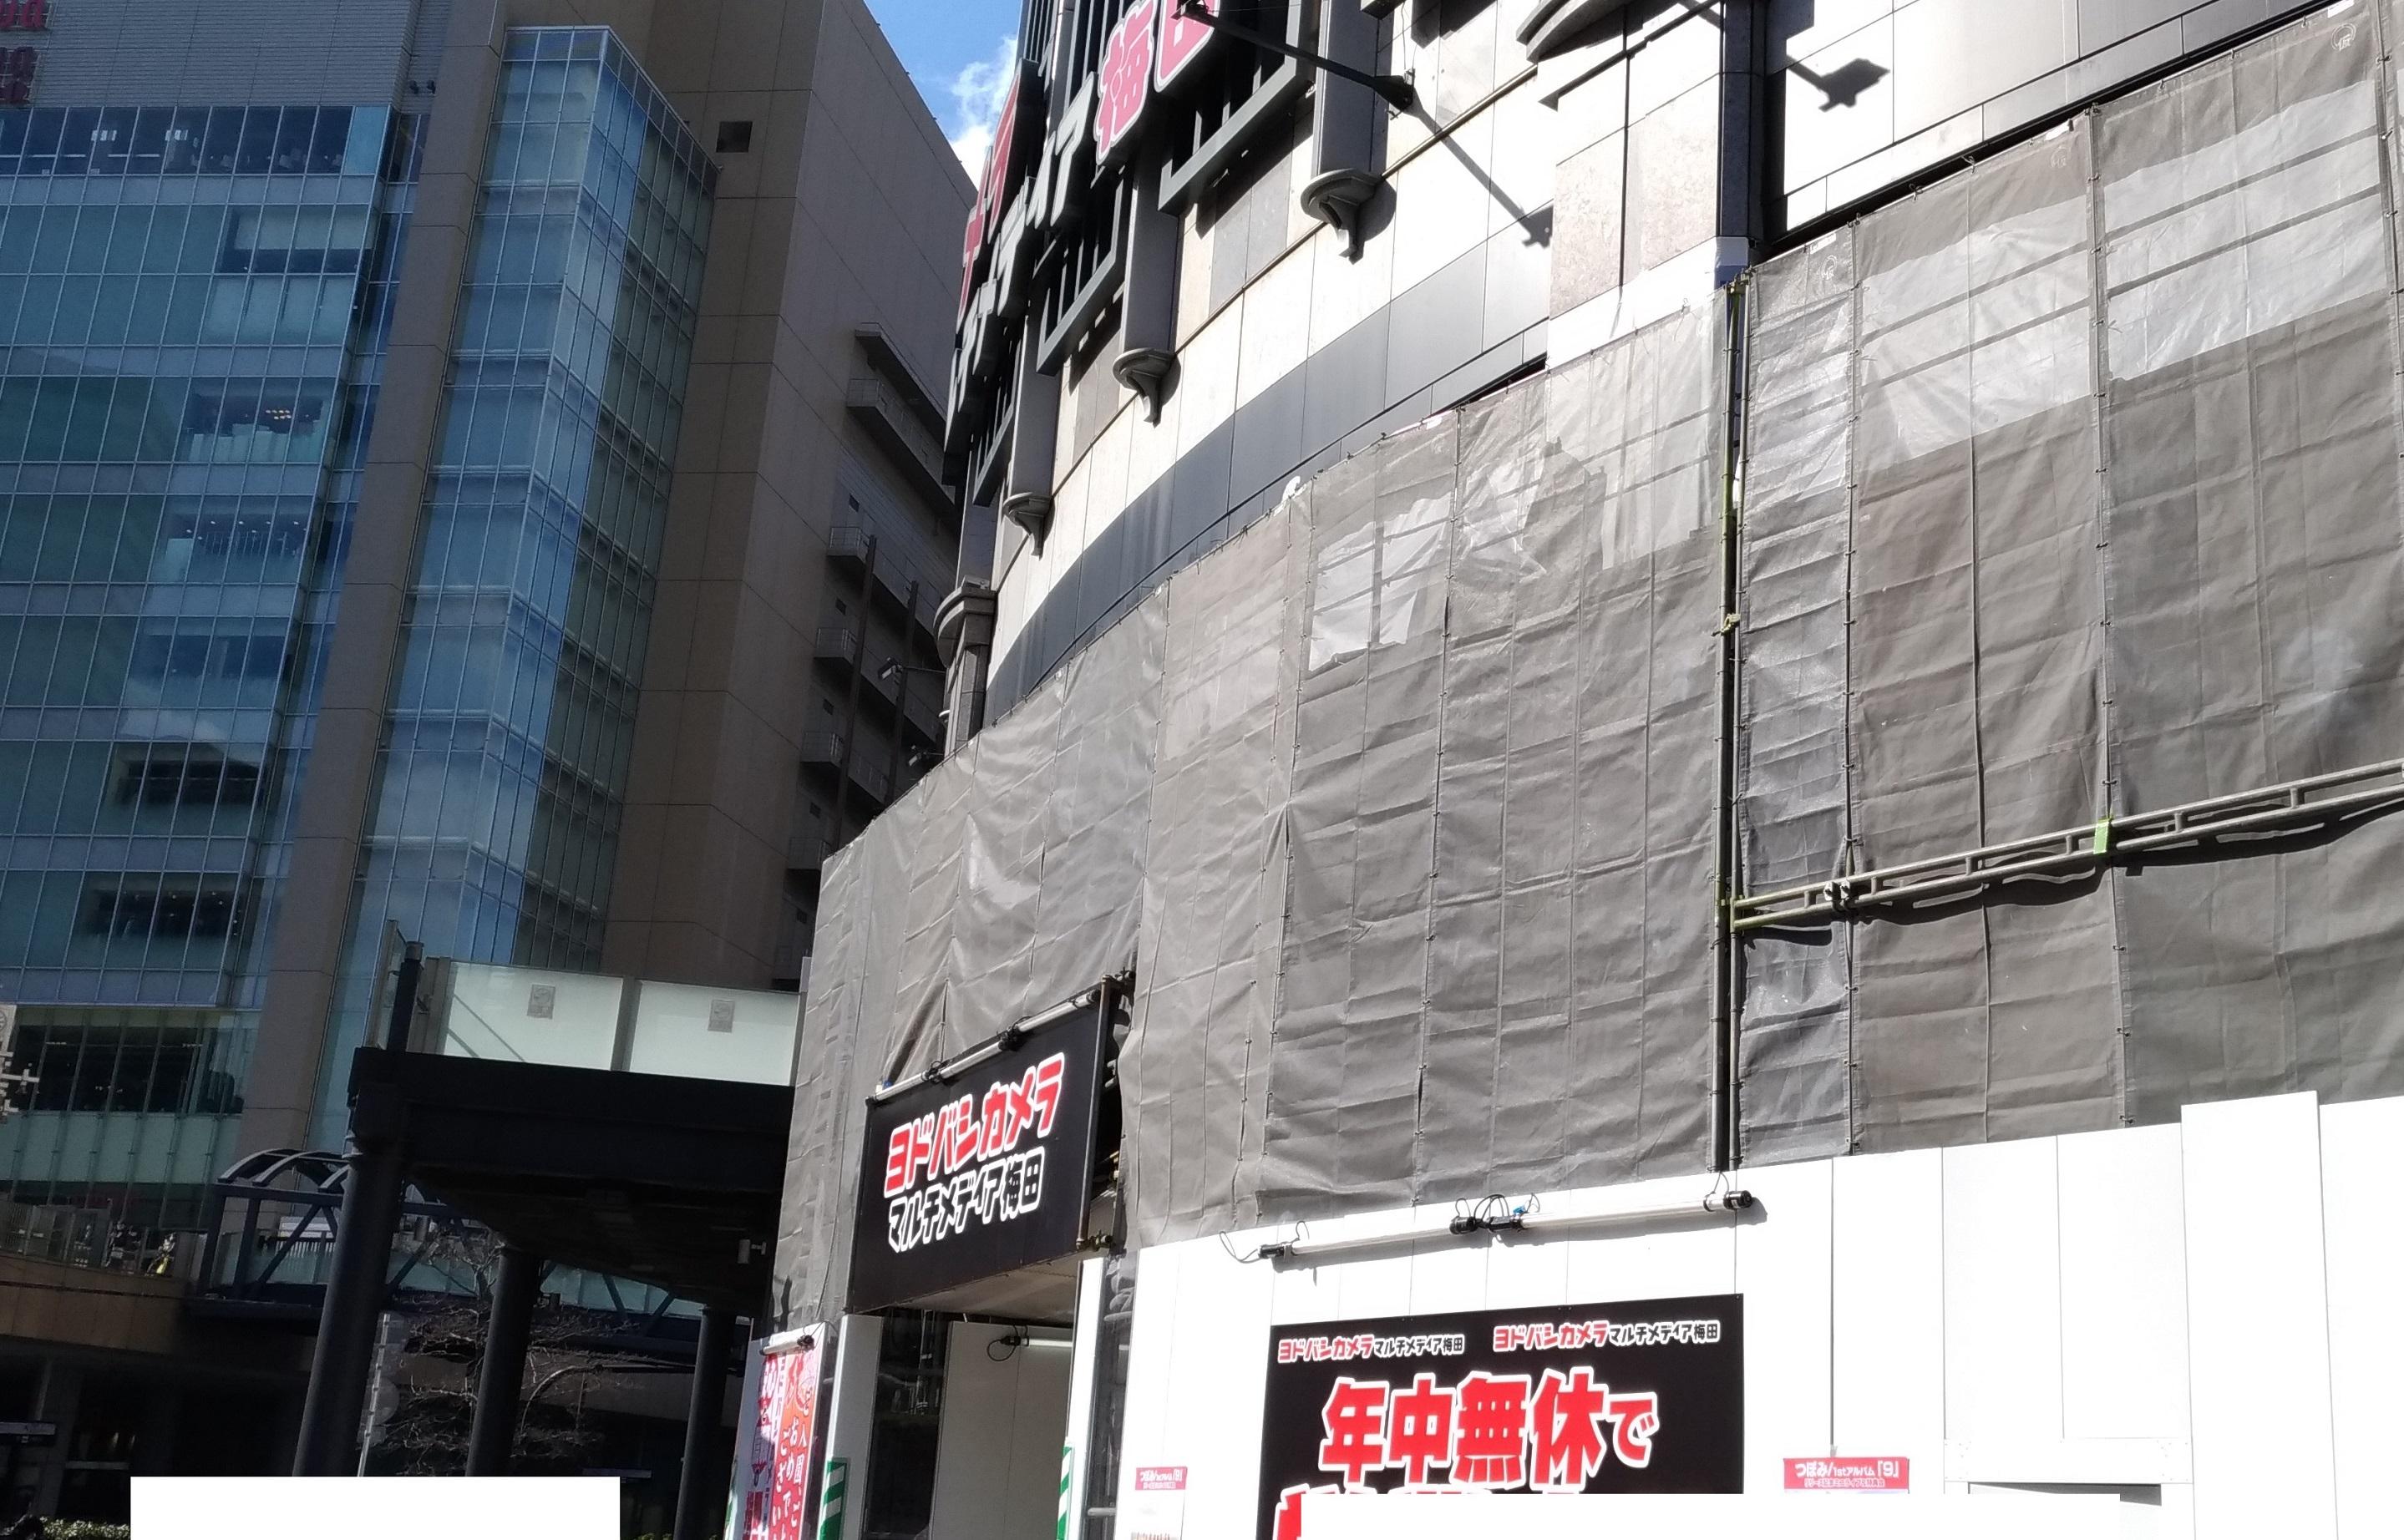 osaka_events_tsubomi_yodobashi2.jpg